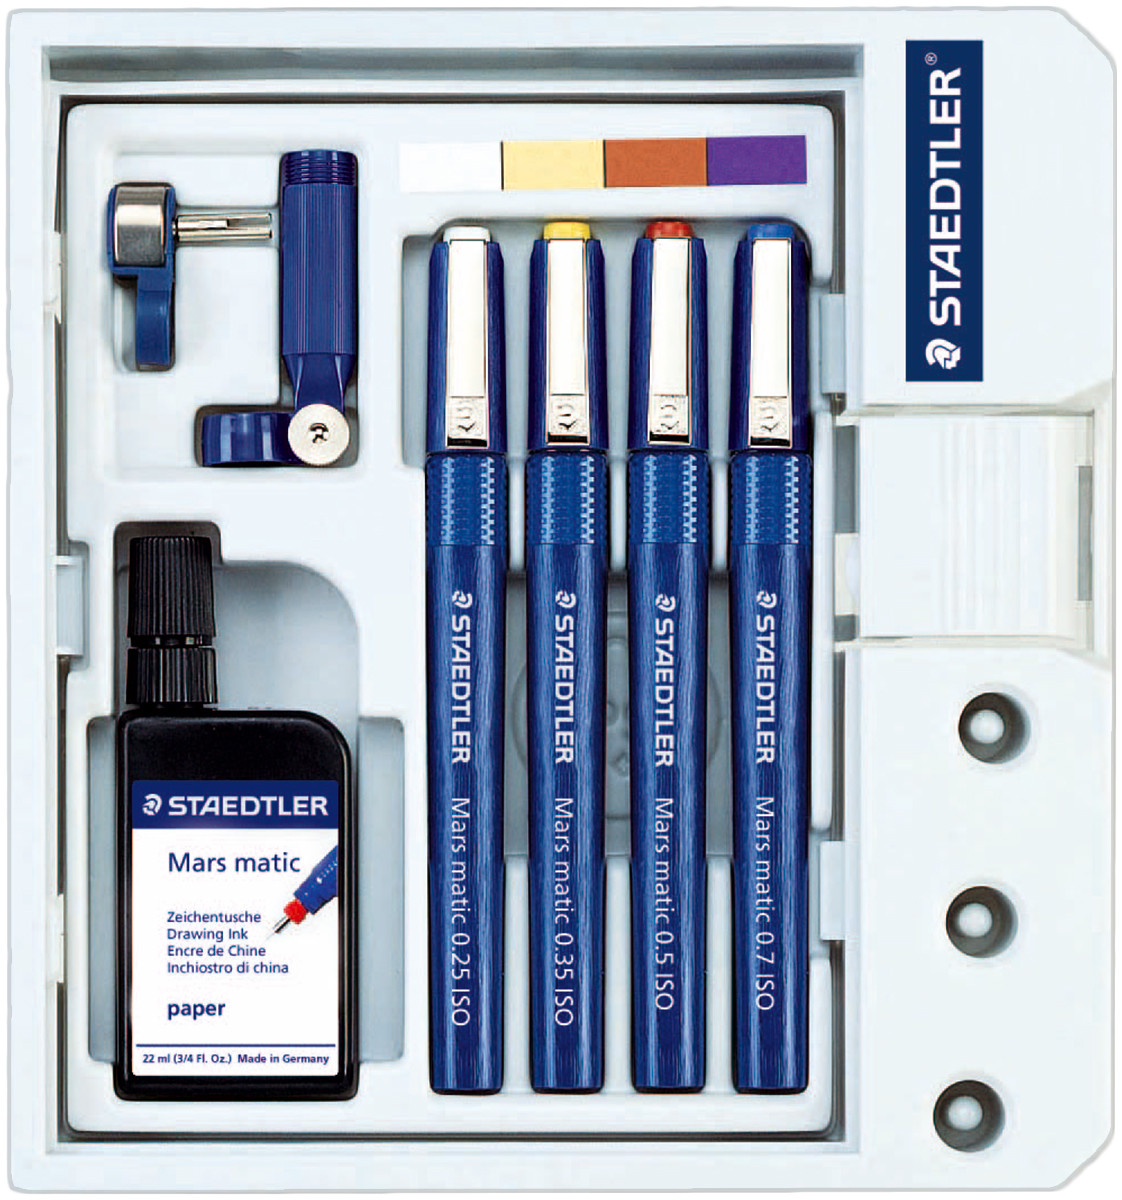 Staedtler Mars Matic Technical Pen Set - 0.25/0.35/0.5/0.7mm